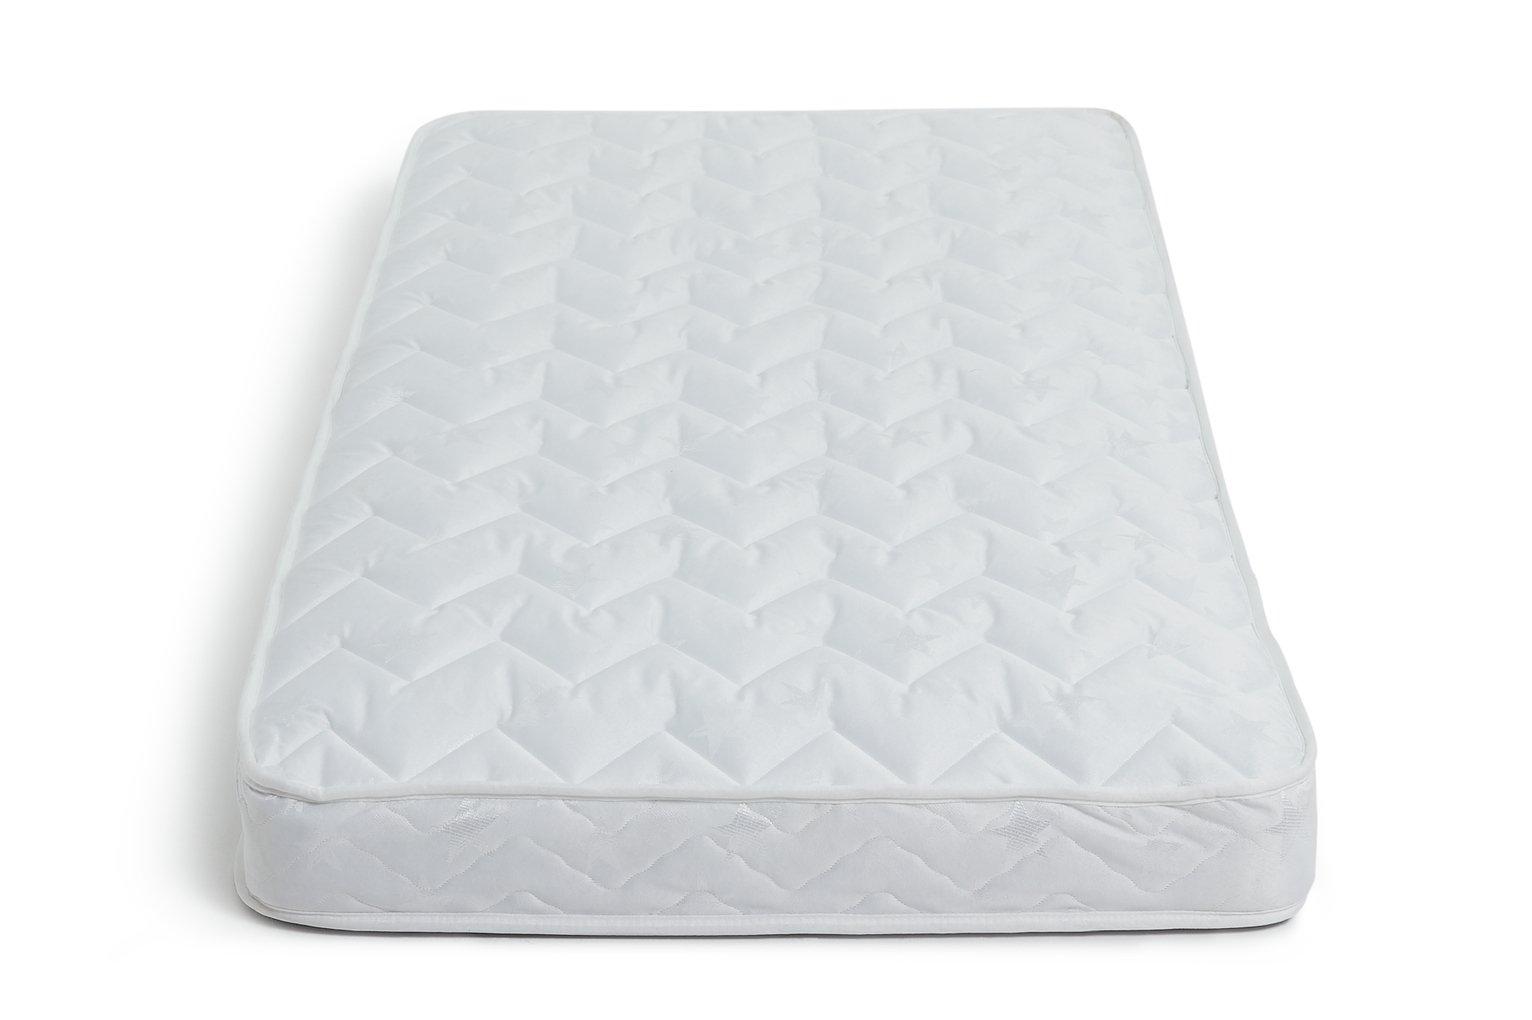 Airsprung - New Elliott Comfort Shorty Mattress - White